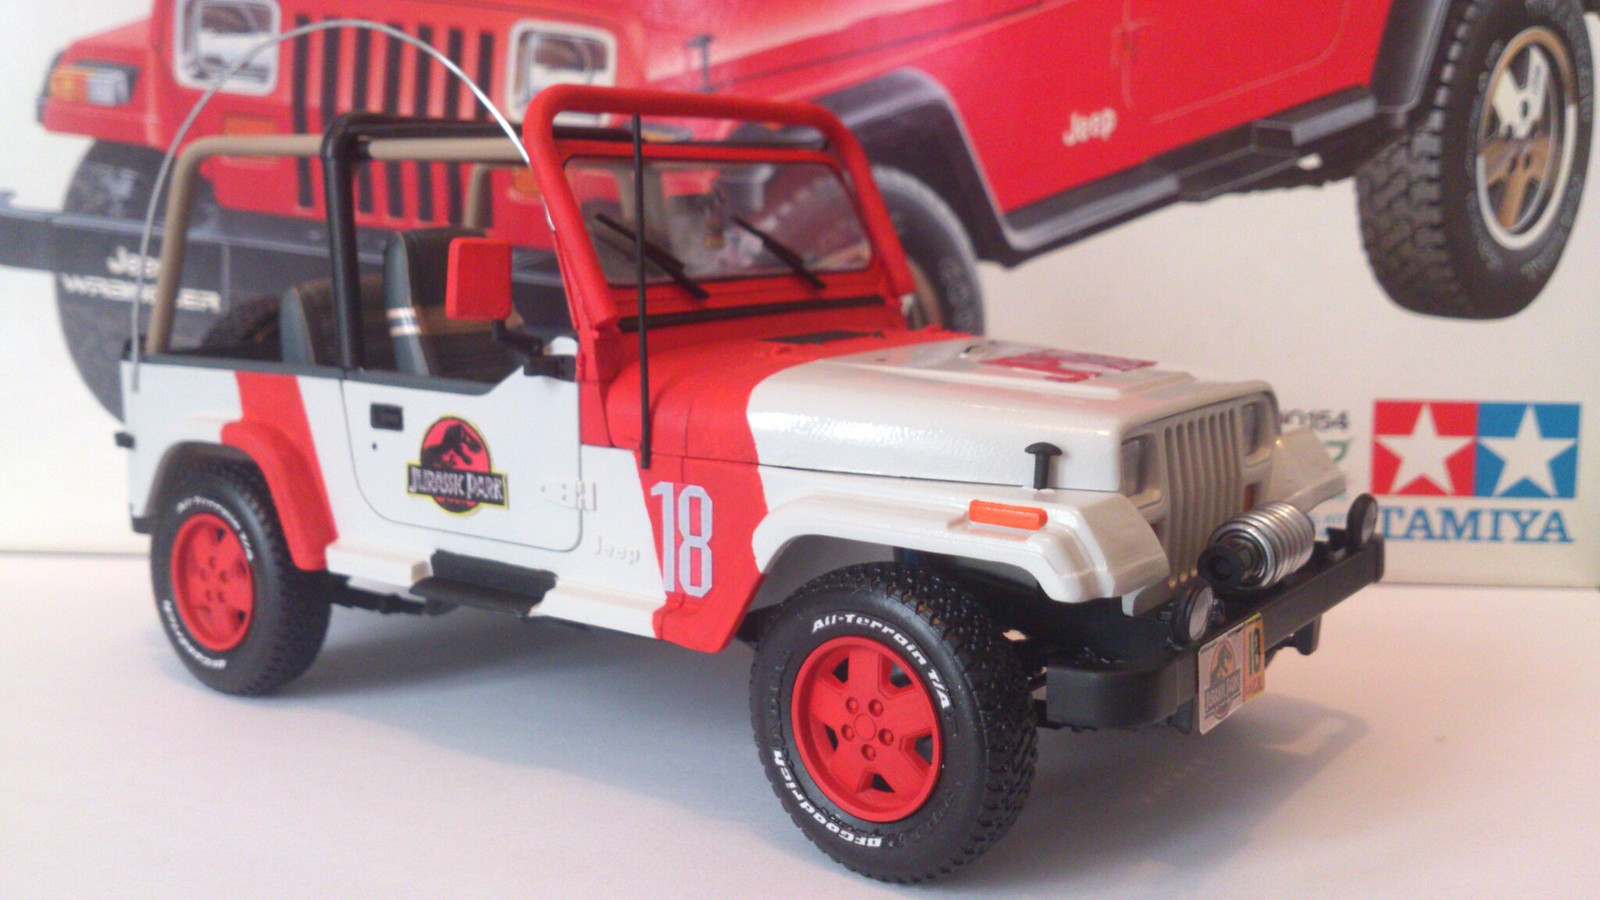 custom jurassic park jeep wrangler open-top 1/24 tamiya toy